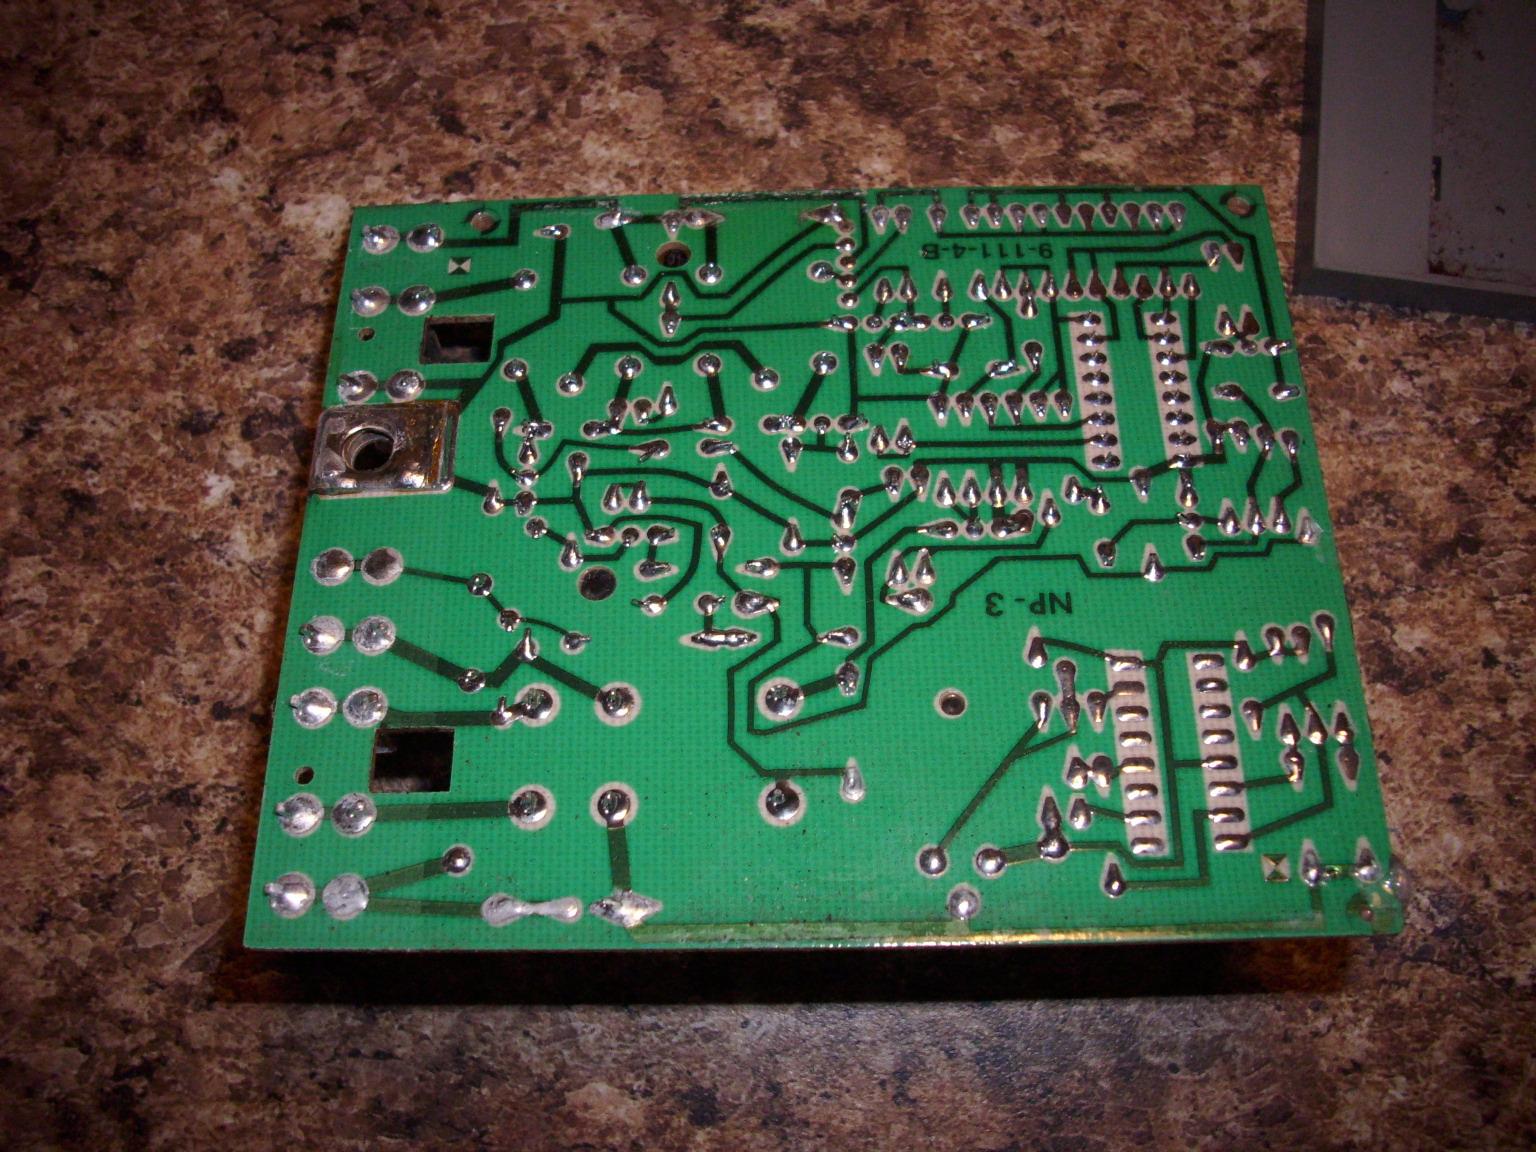 hsi3 steves fix it shop robertshaw hs780 teardown robertshaw hs780 wiring diagram at aneh.co